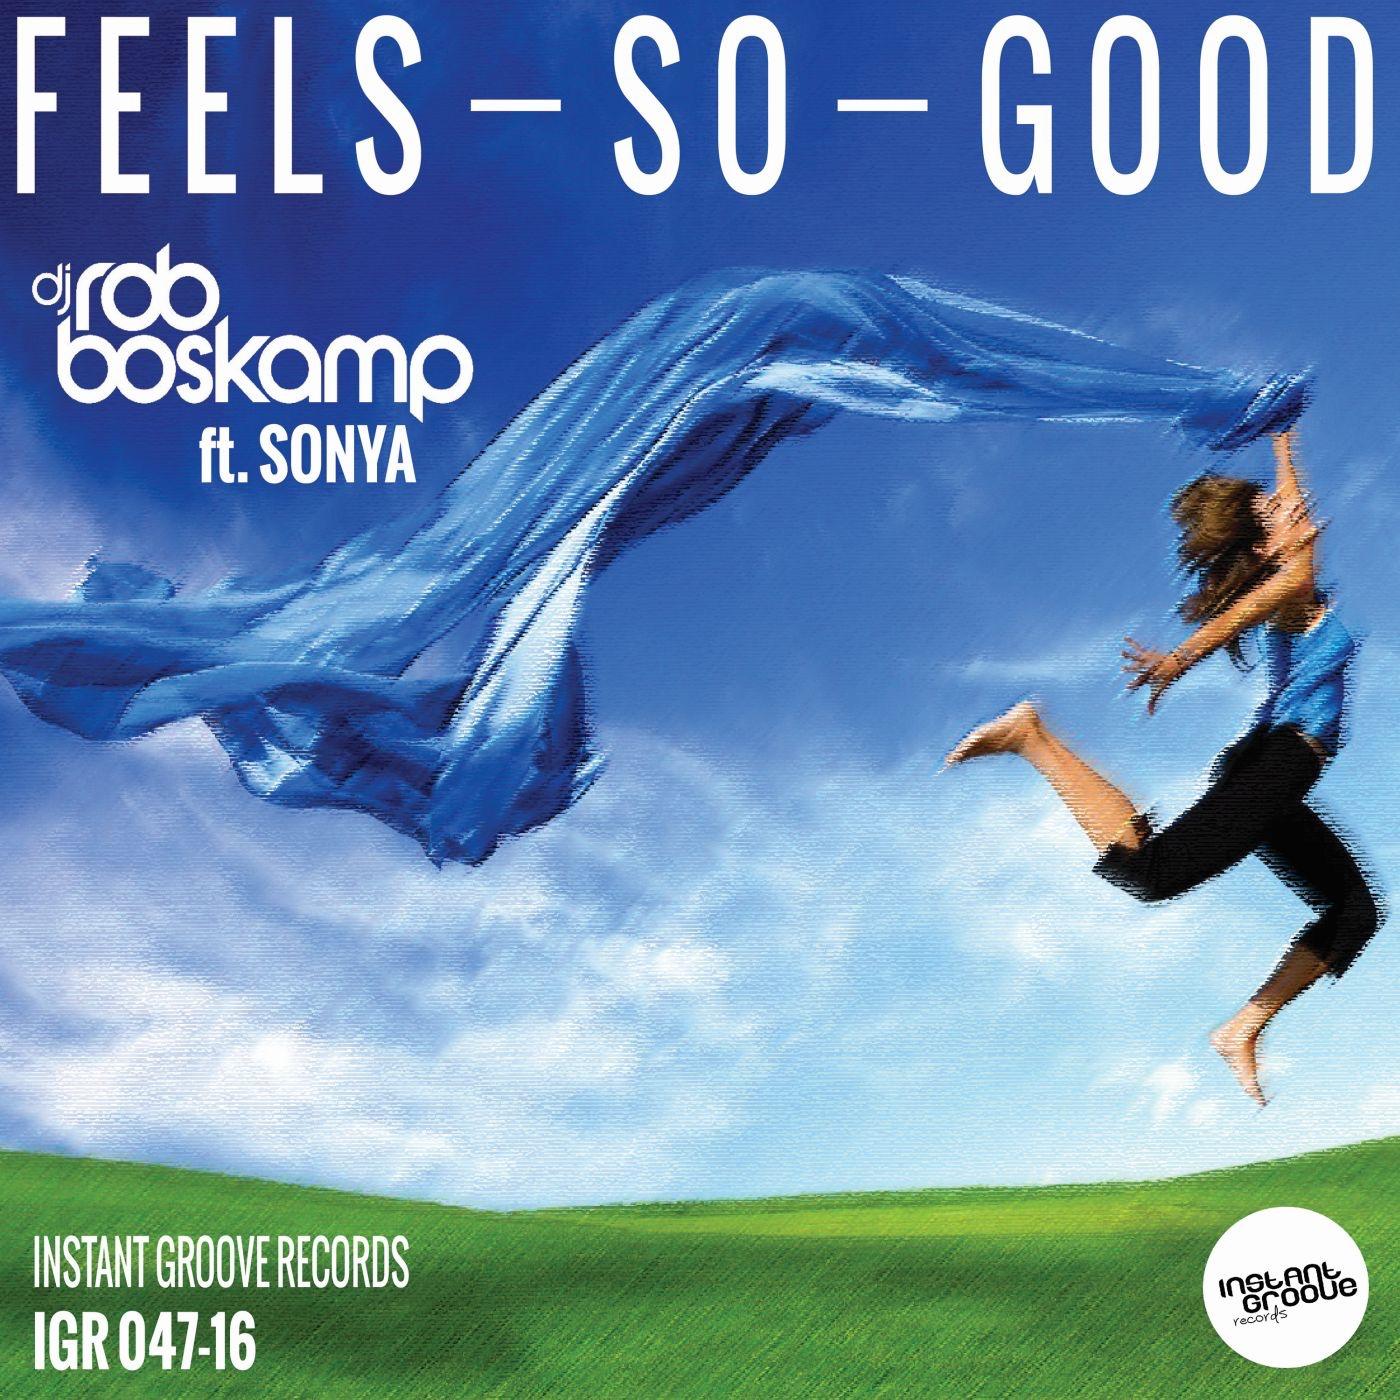 Feels So Good (feat. Sonya) - Single